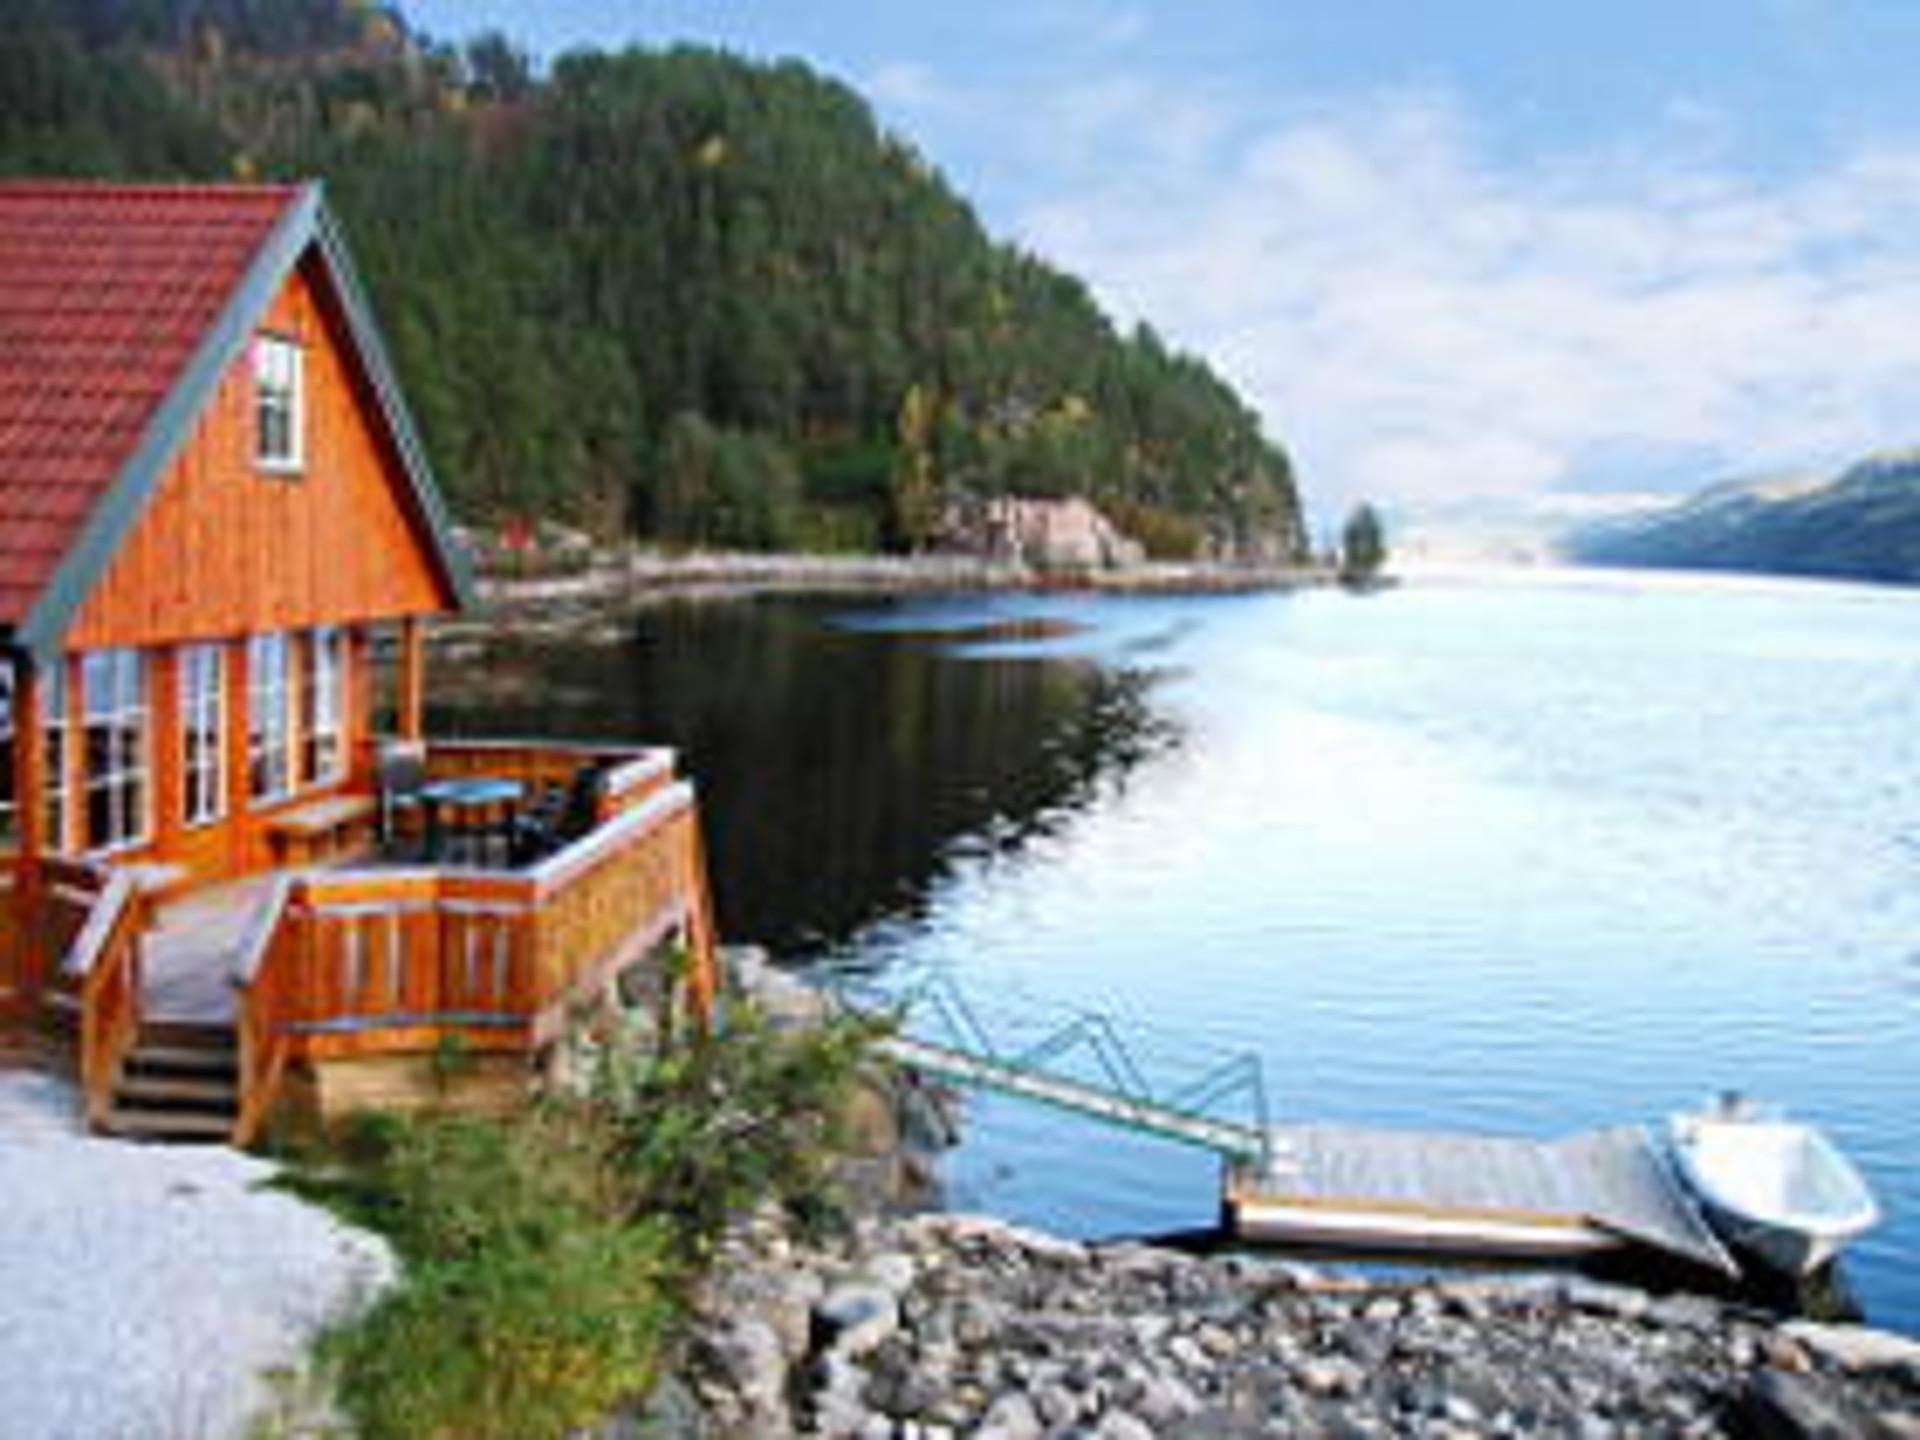 norwegen norwegen spezielle ferienh user f r angler. Black Bedroom Furniture Sets. Home Design Ideas